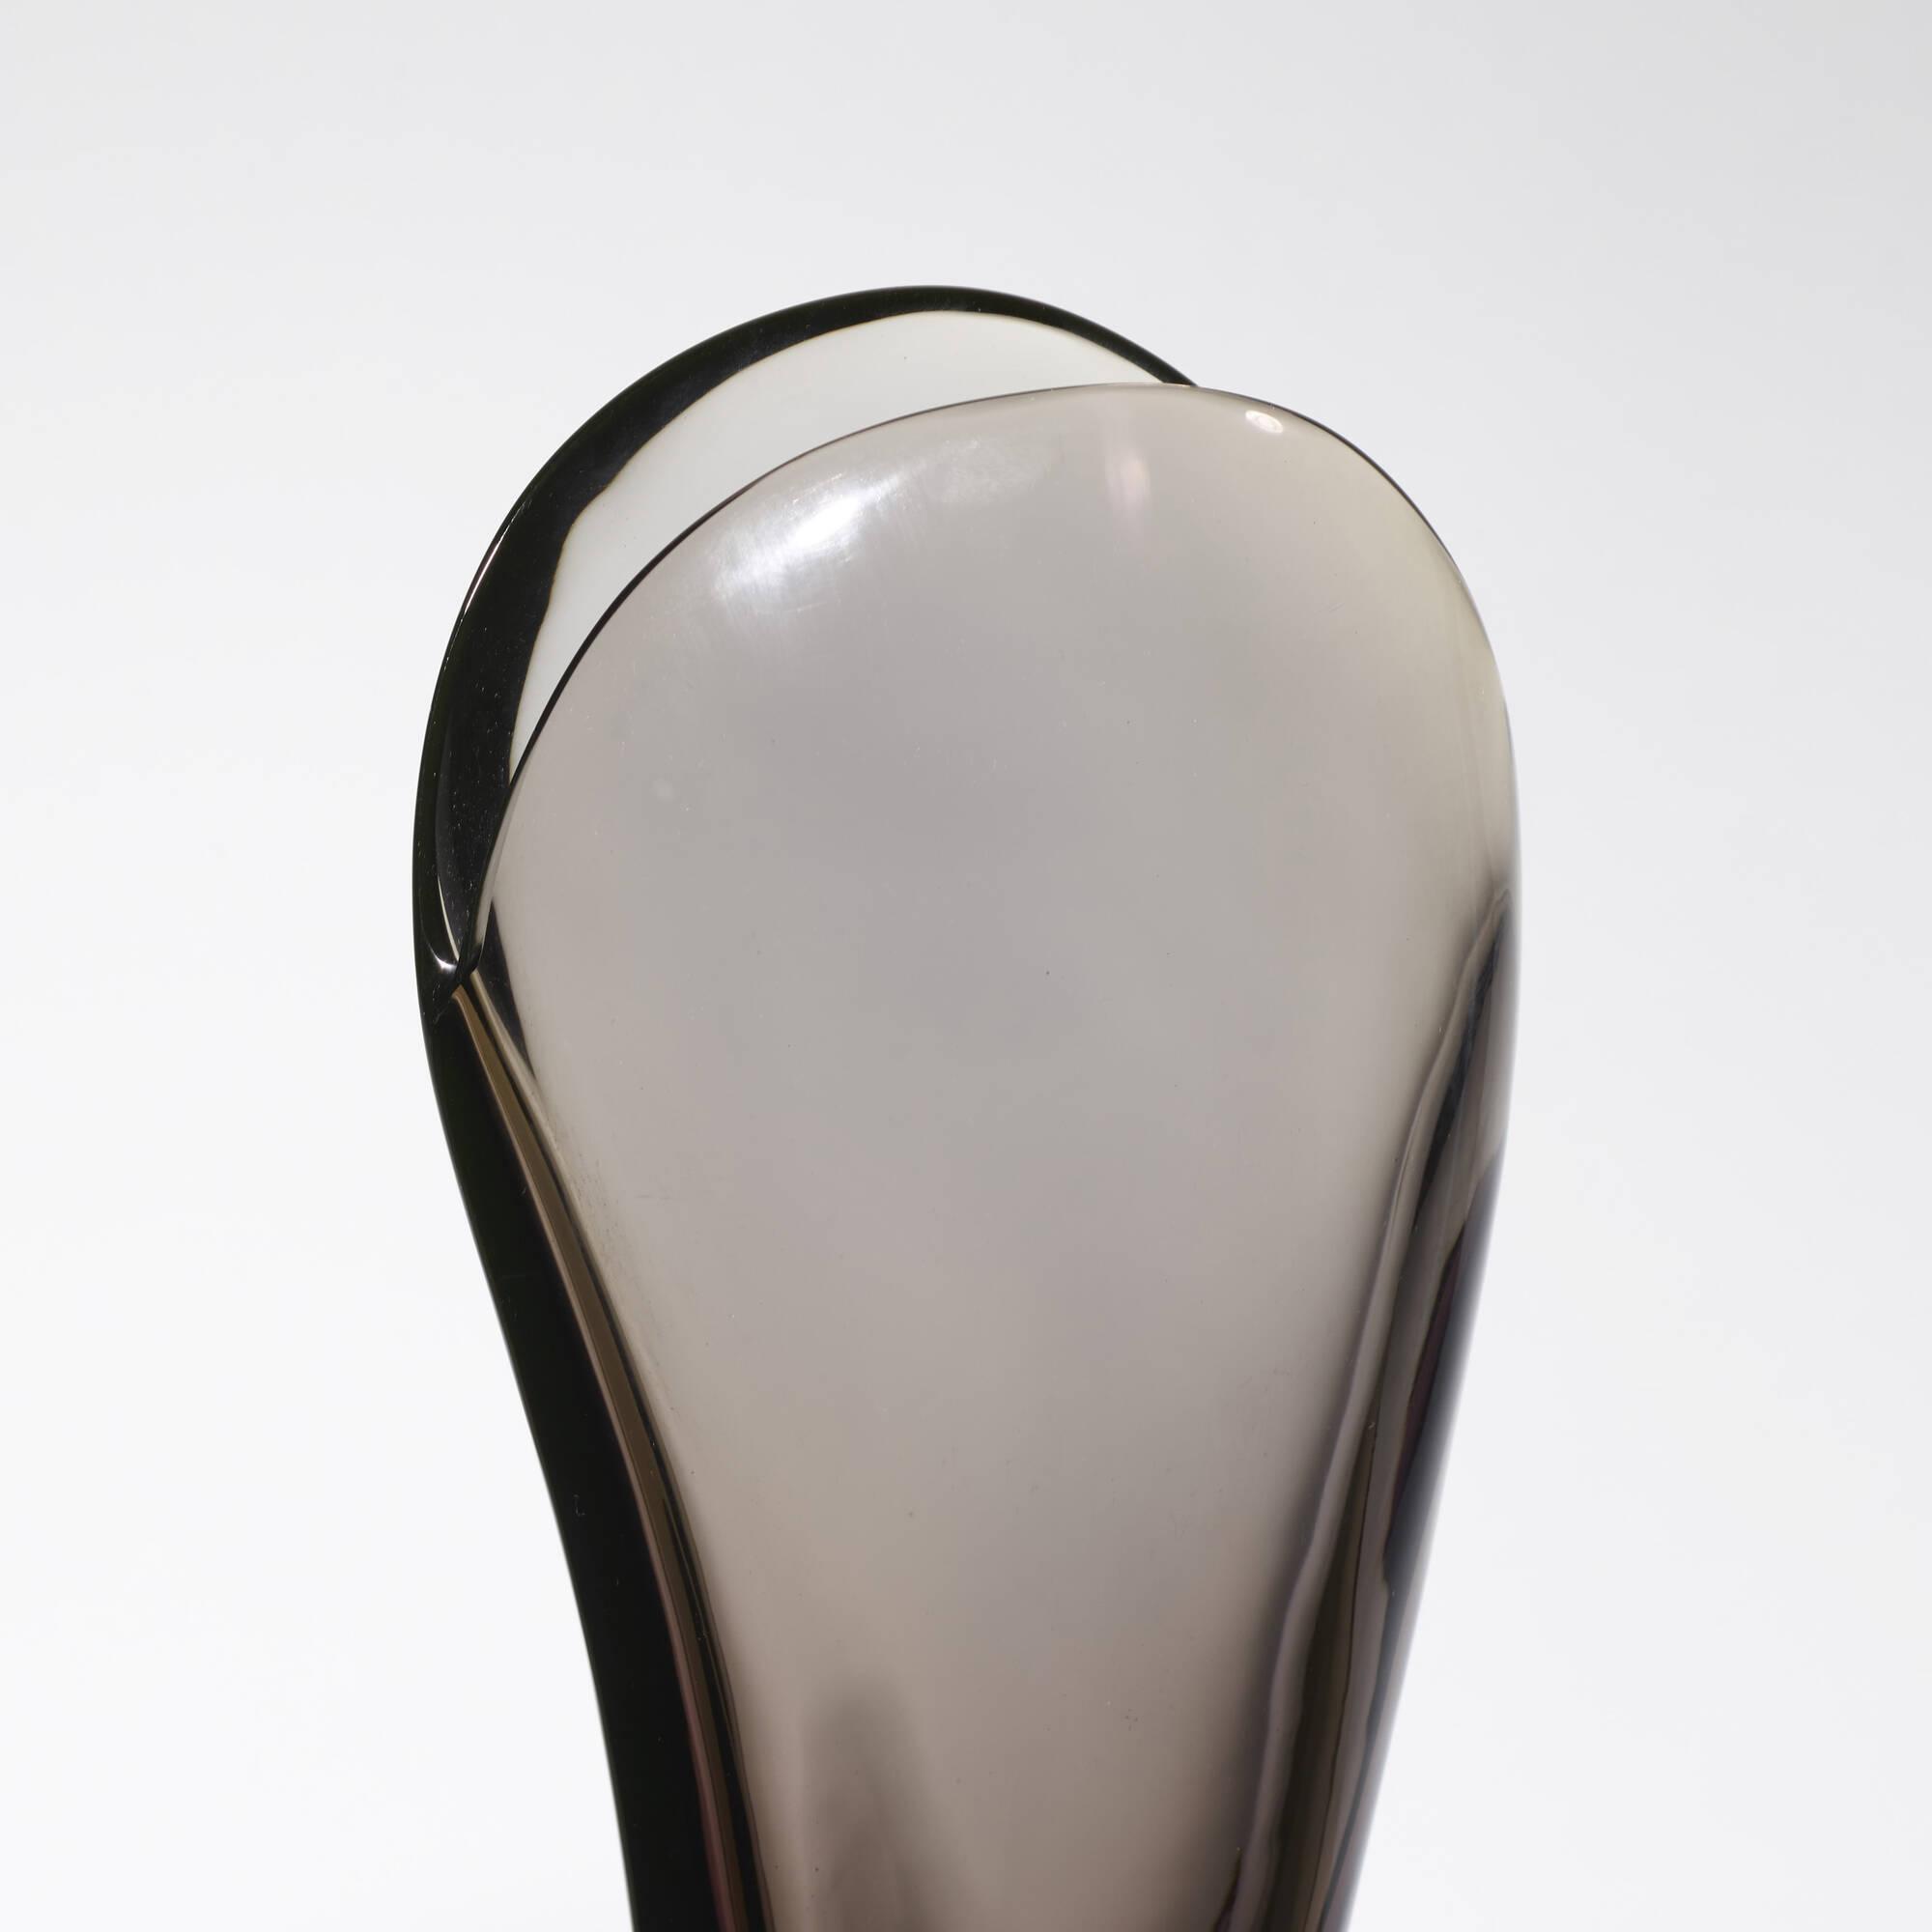 164: Flavio Poli / Valva vase, model 11485 (2 of 2)